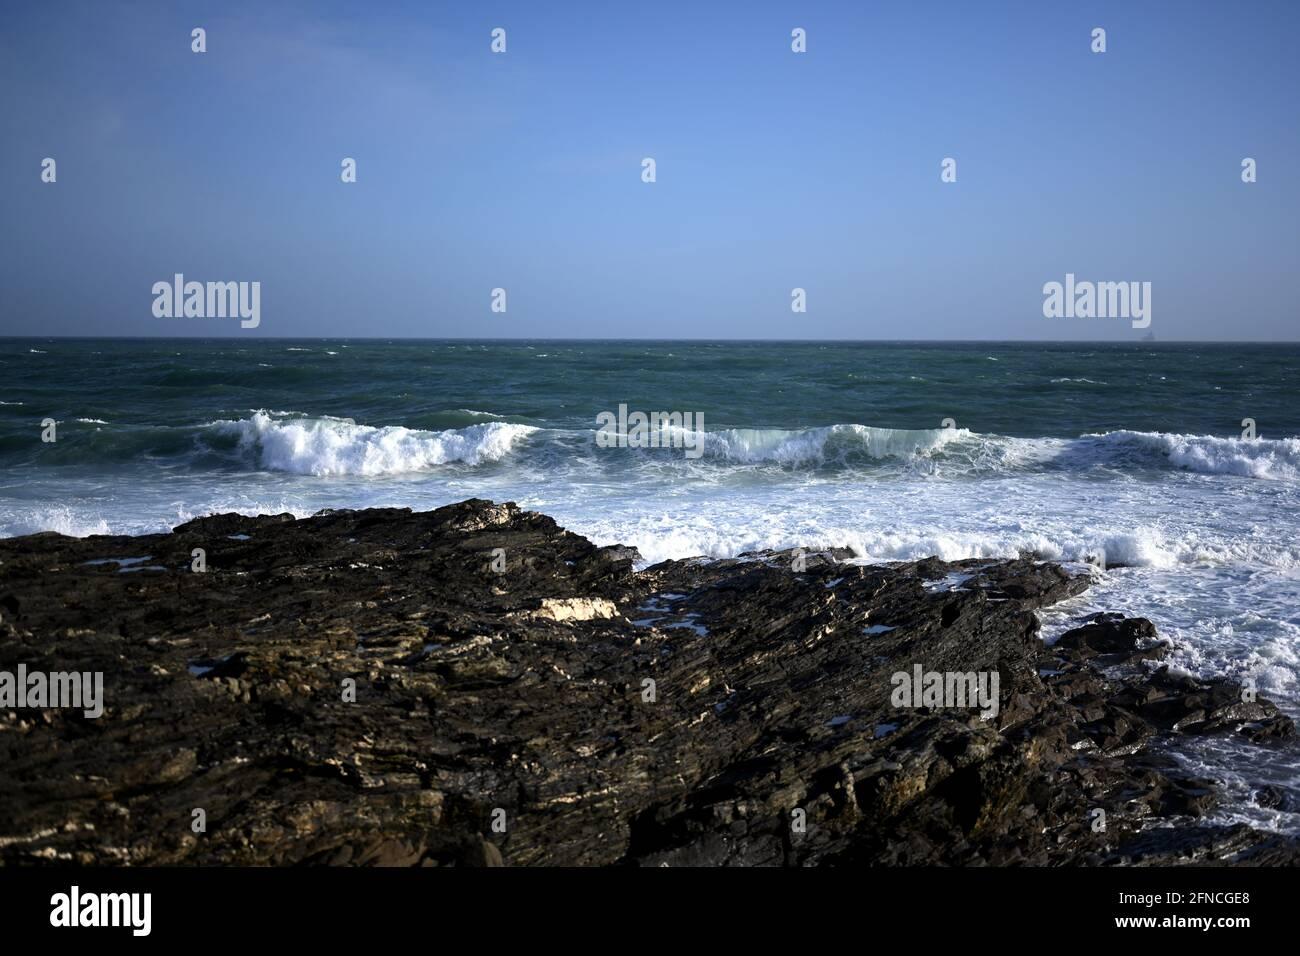 Beautiful seascape with rocky coastline and waves crashing onto the rocks, rocky and rugged coastline concept Stock Photo